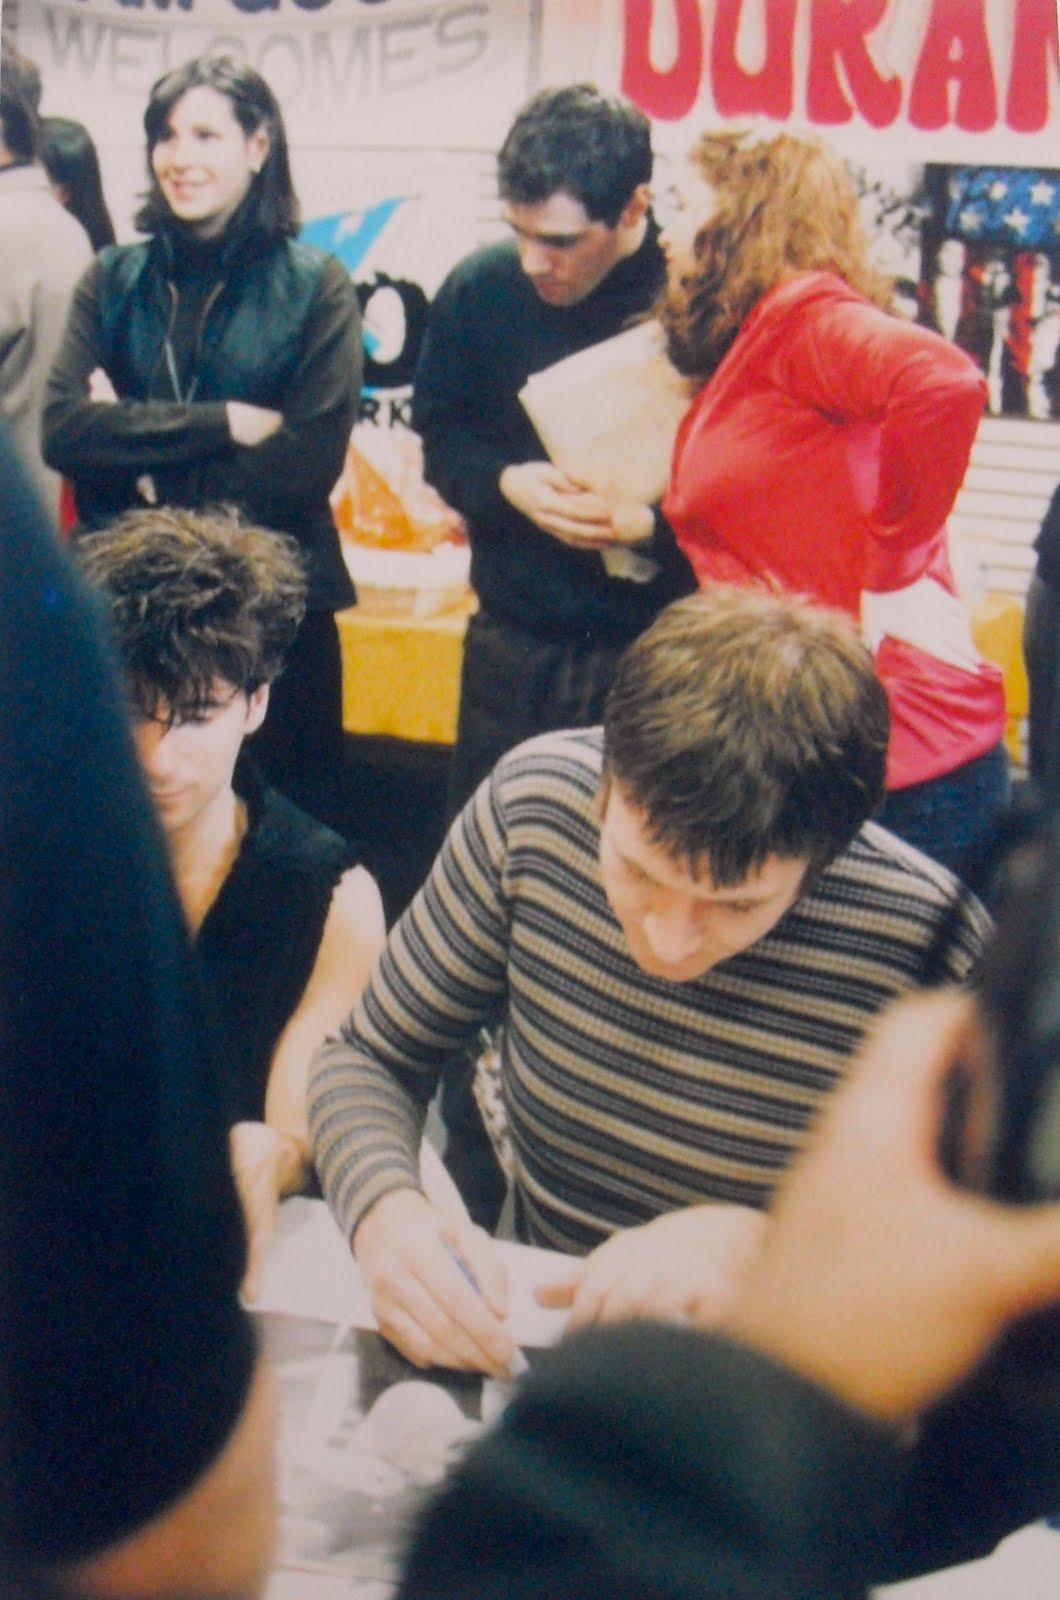 http://1.bp.blogspot.com/-1e1jp2I-7u0/TeAEFHf8h7I/AAAAAAAAEO0/Znt2iu8_5PA/s1600/Duran+Duran+1995+Sam+Goody+In+Store+Appearance+NYC+1.JPG